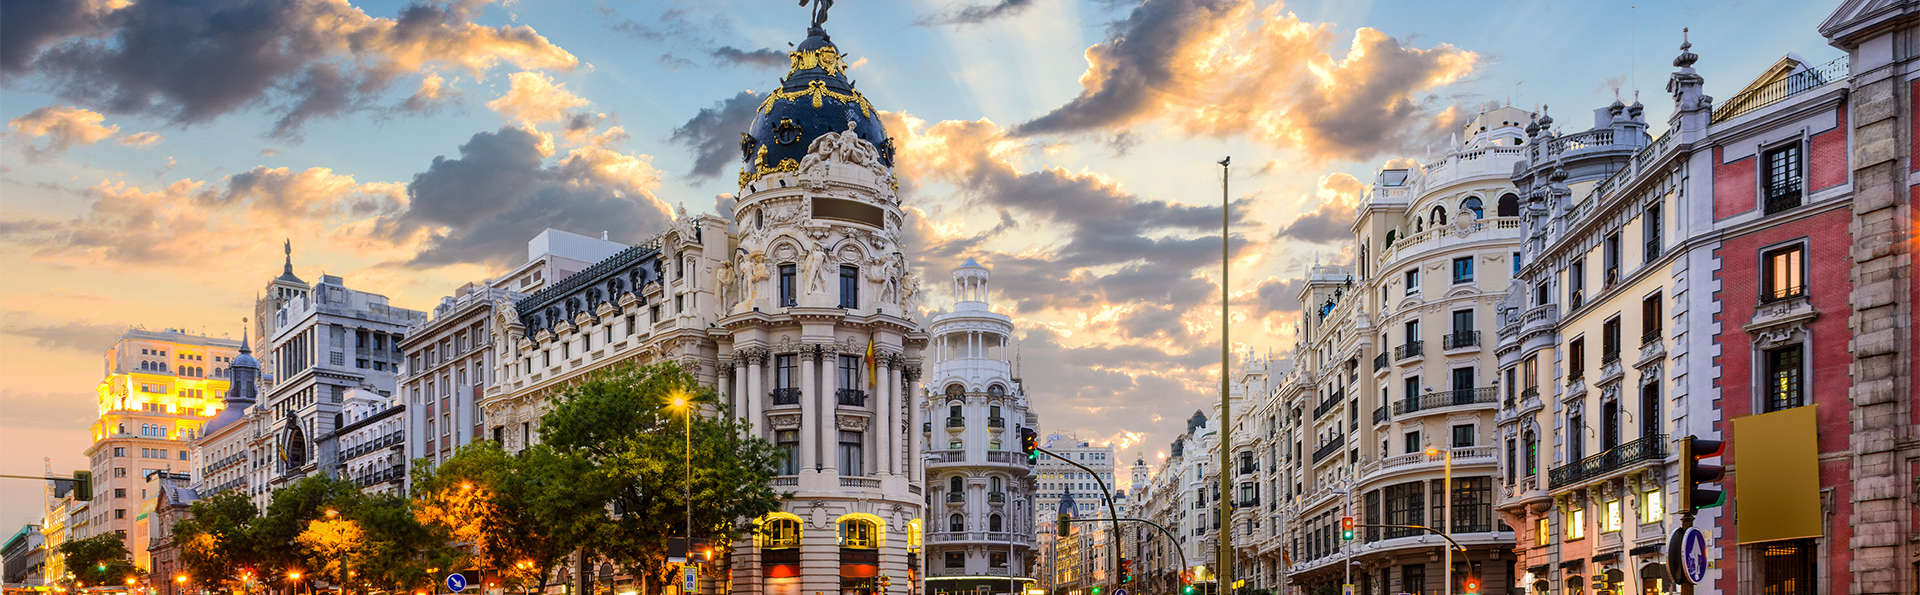 H10 Puerta de Alcalá - EDIT_madrid.jpg